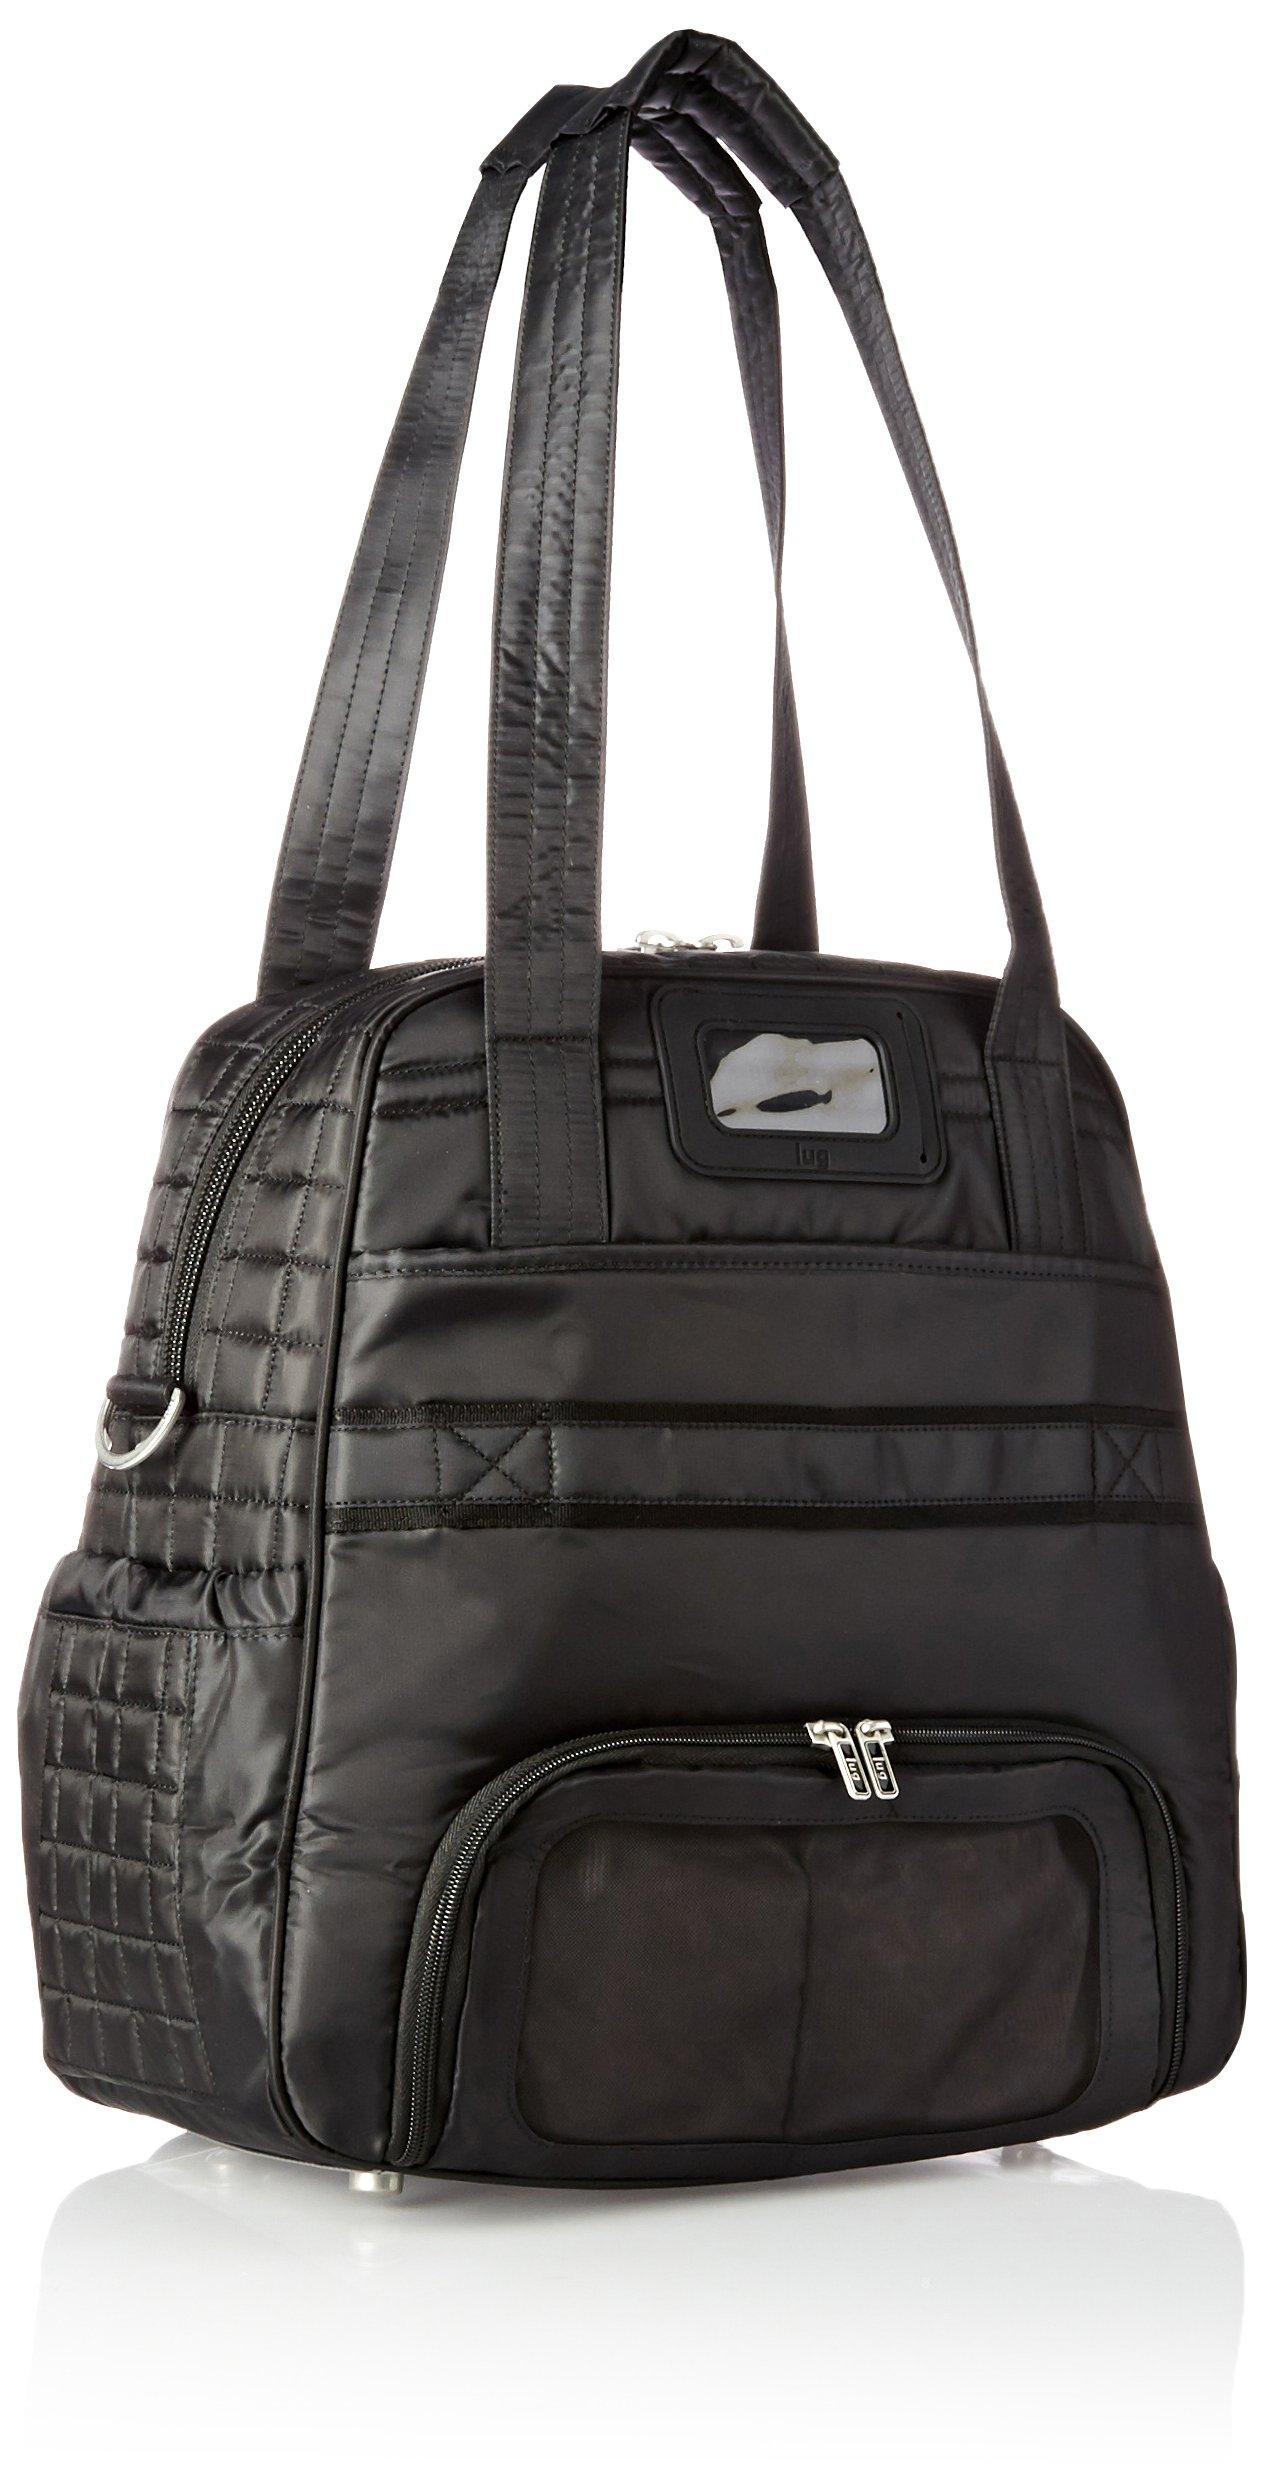 Lug Puddle Jumper Overnight/Gym Bag, Midnight Black by Lug (Image #2)